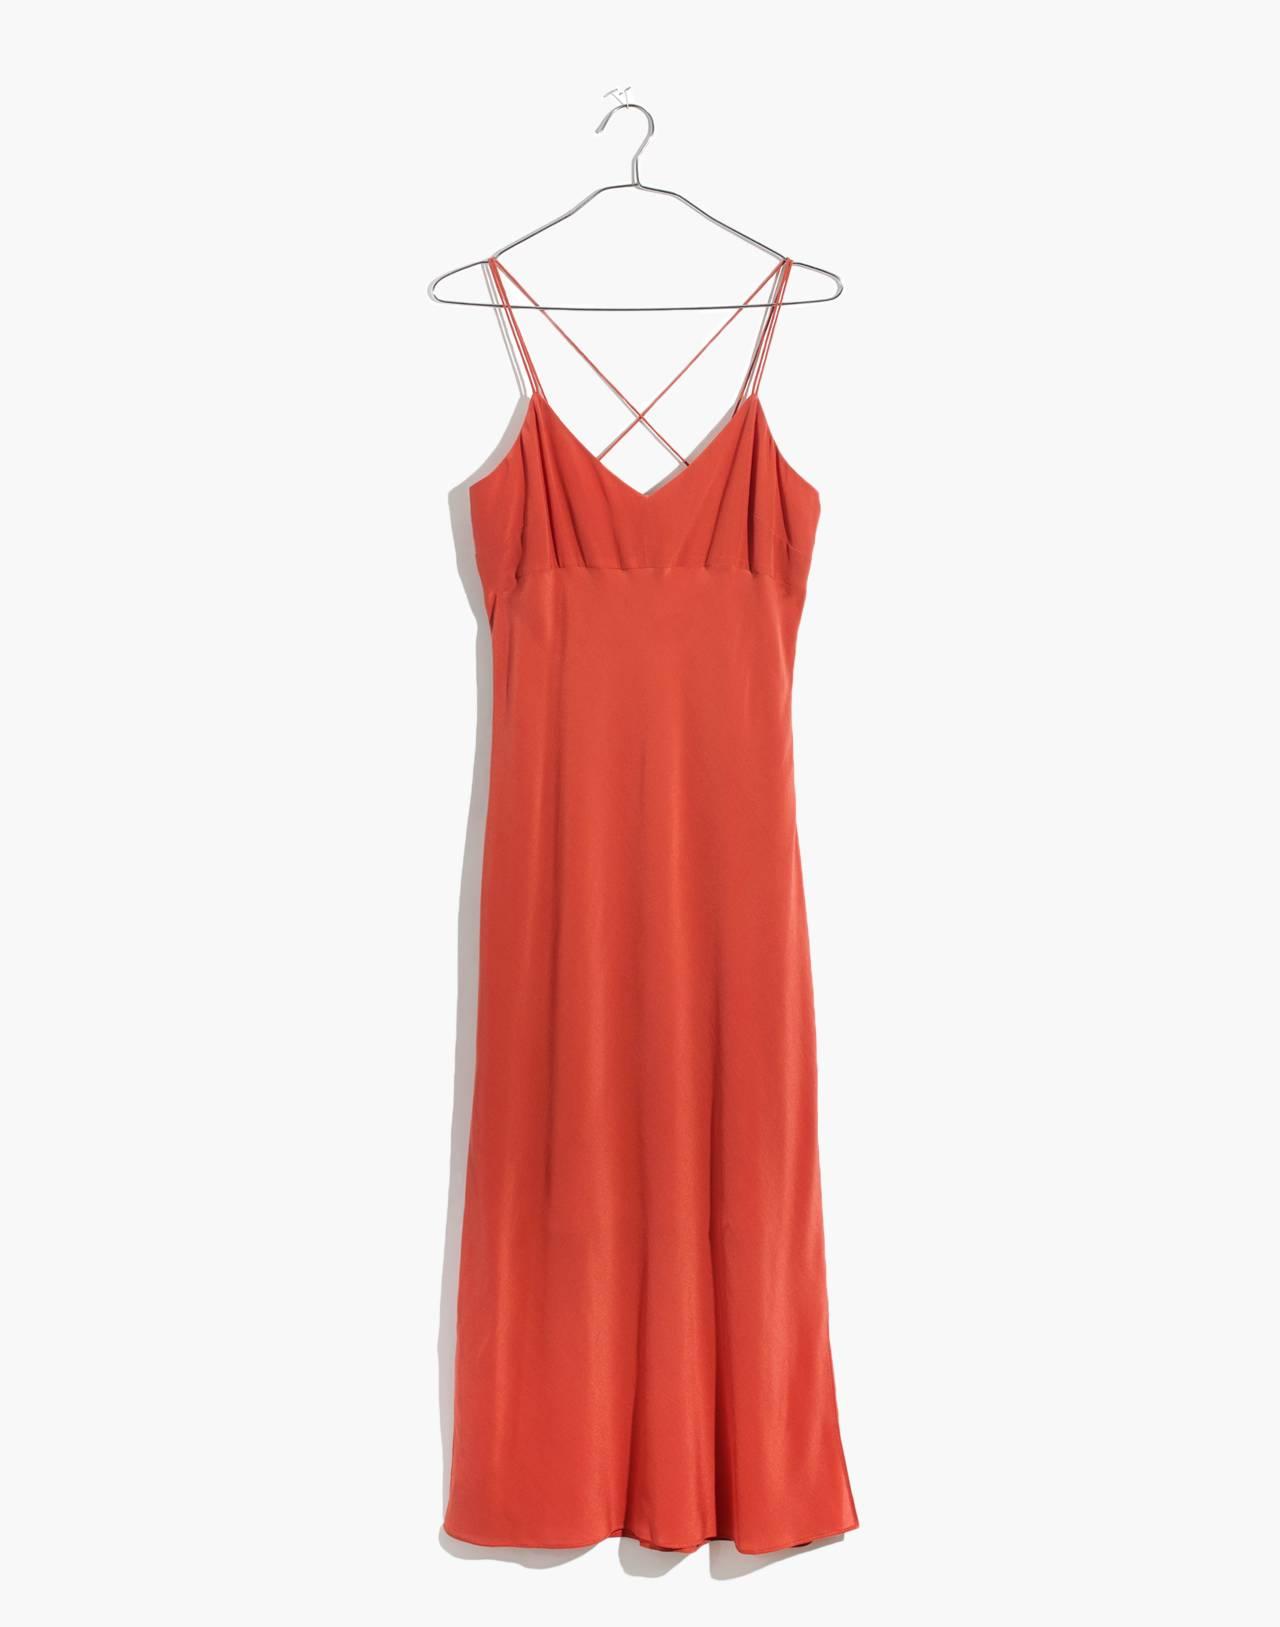 Silk Slip Dress in spiced rose image 4